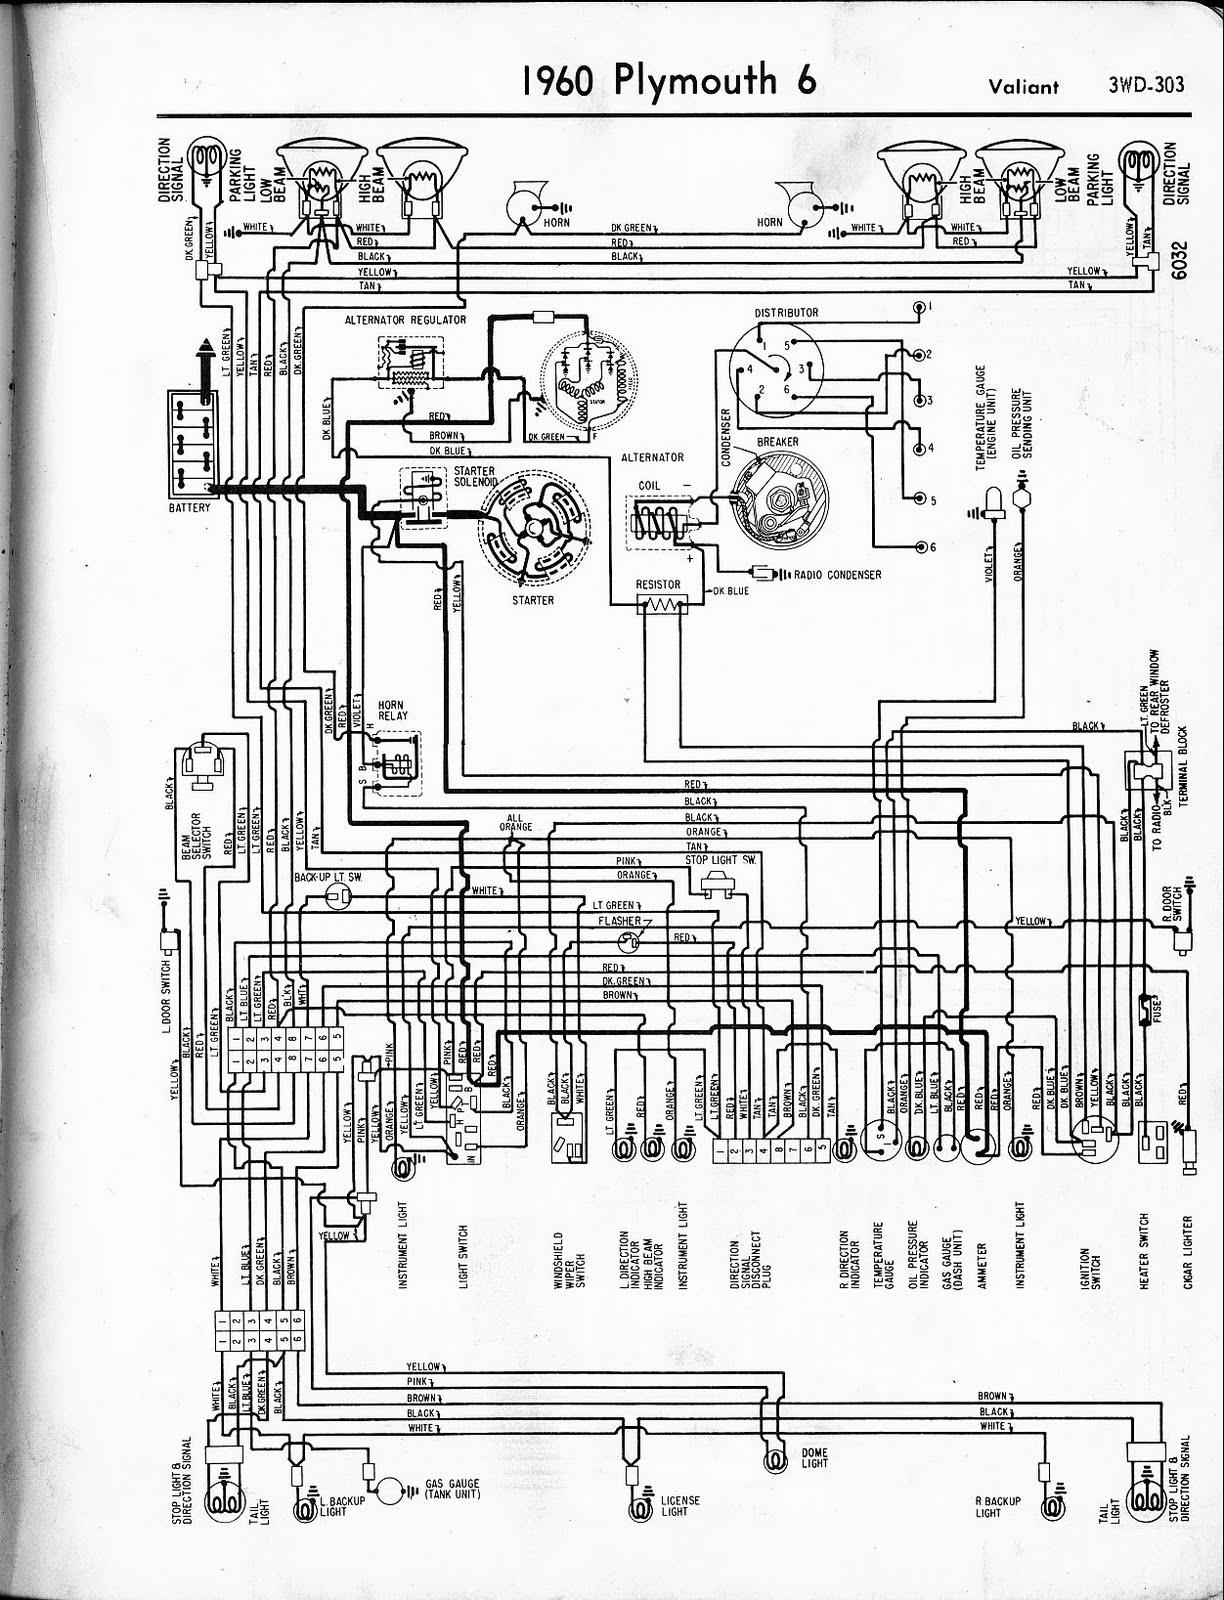 Free Auto Wiring Diagram: 1960 Plymouth Valiant Wiring Diagram